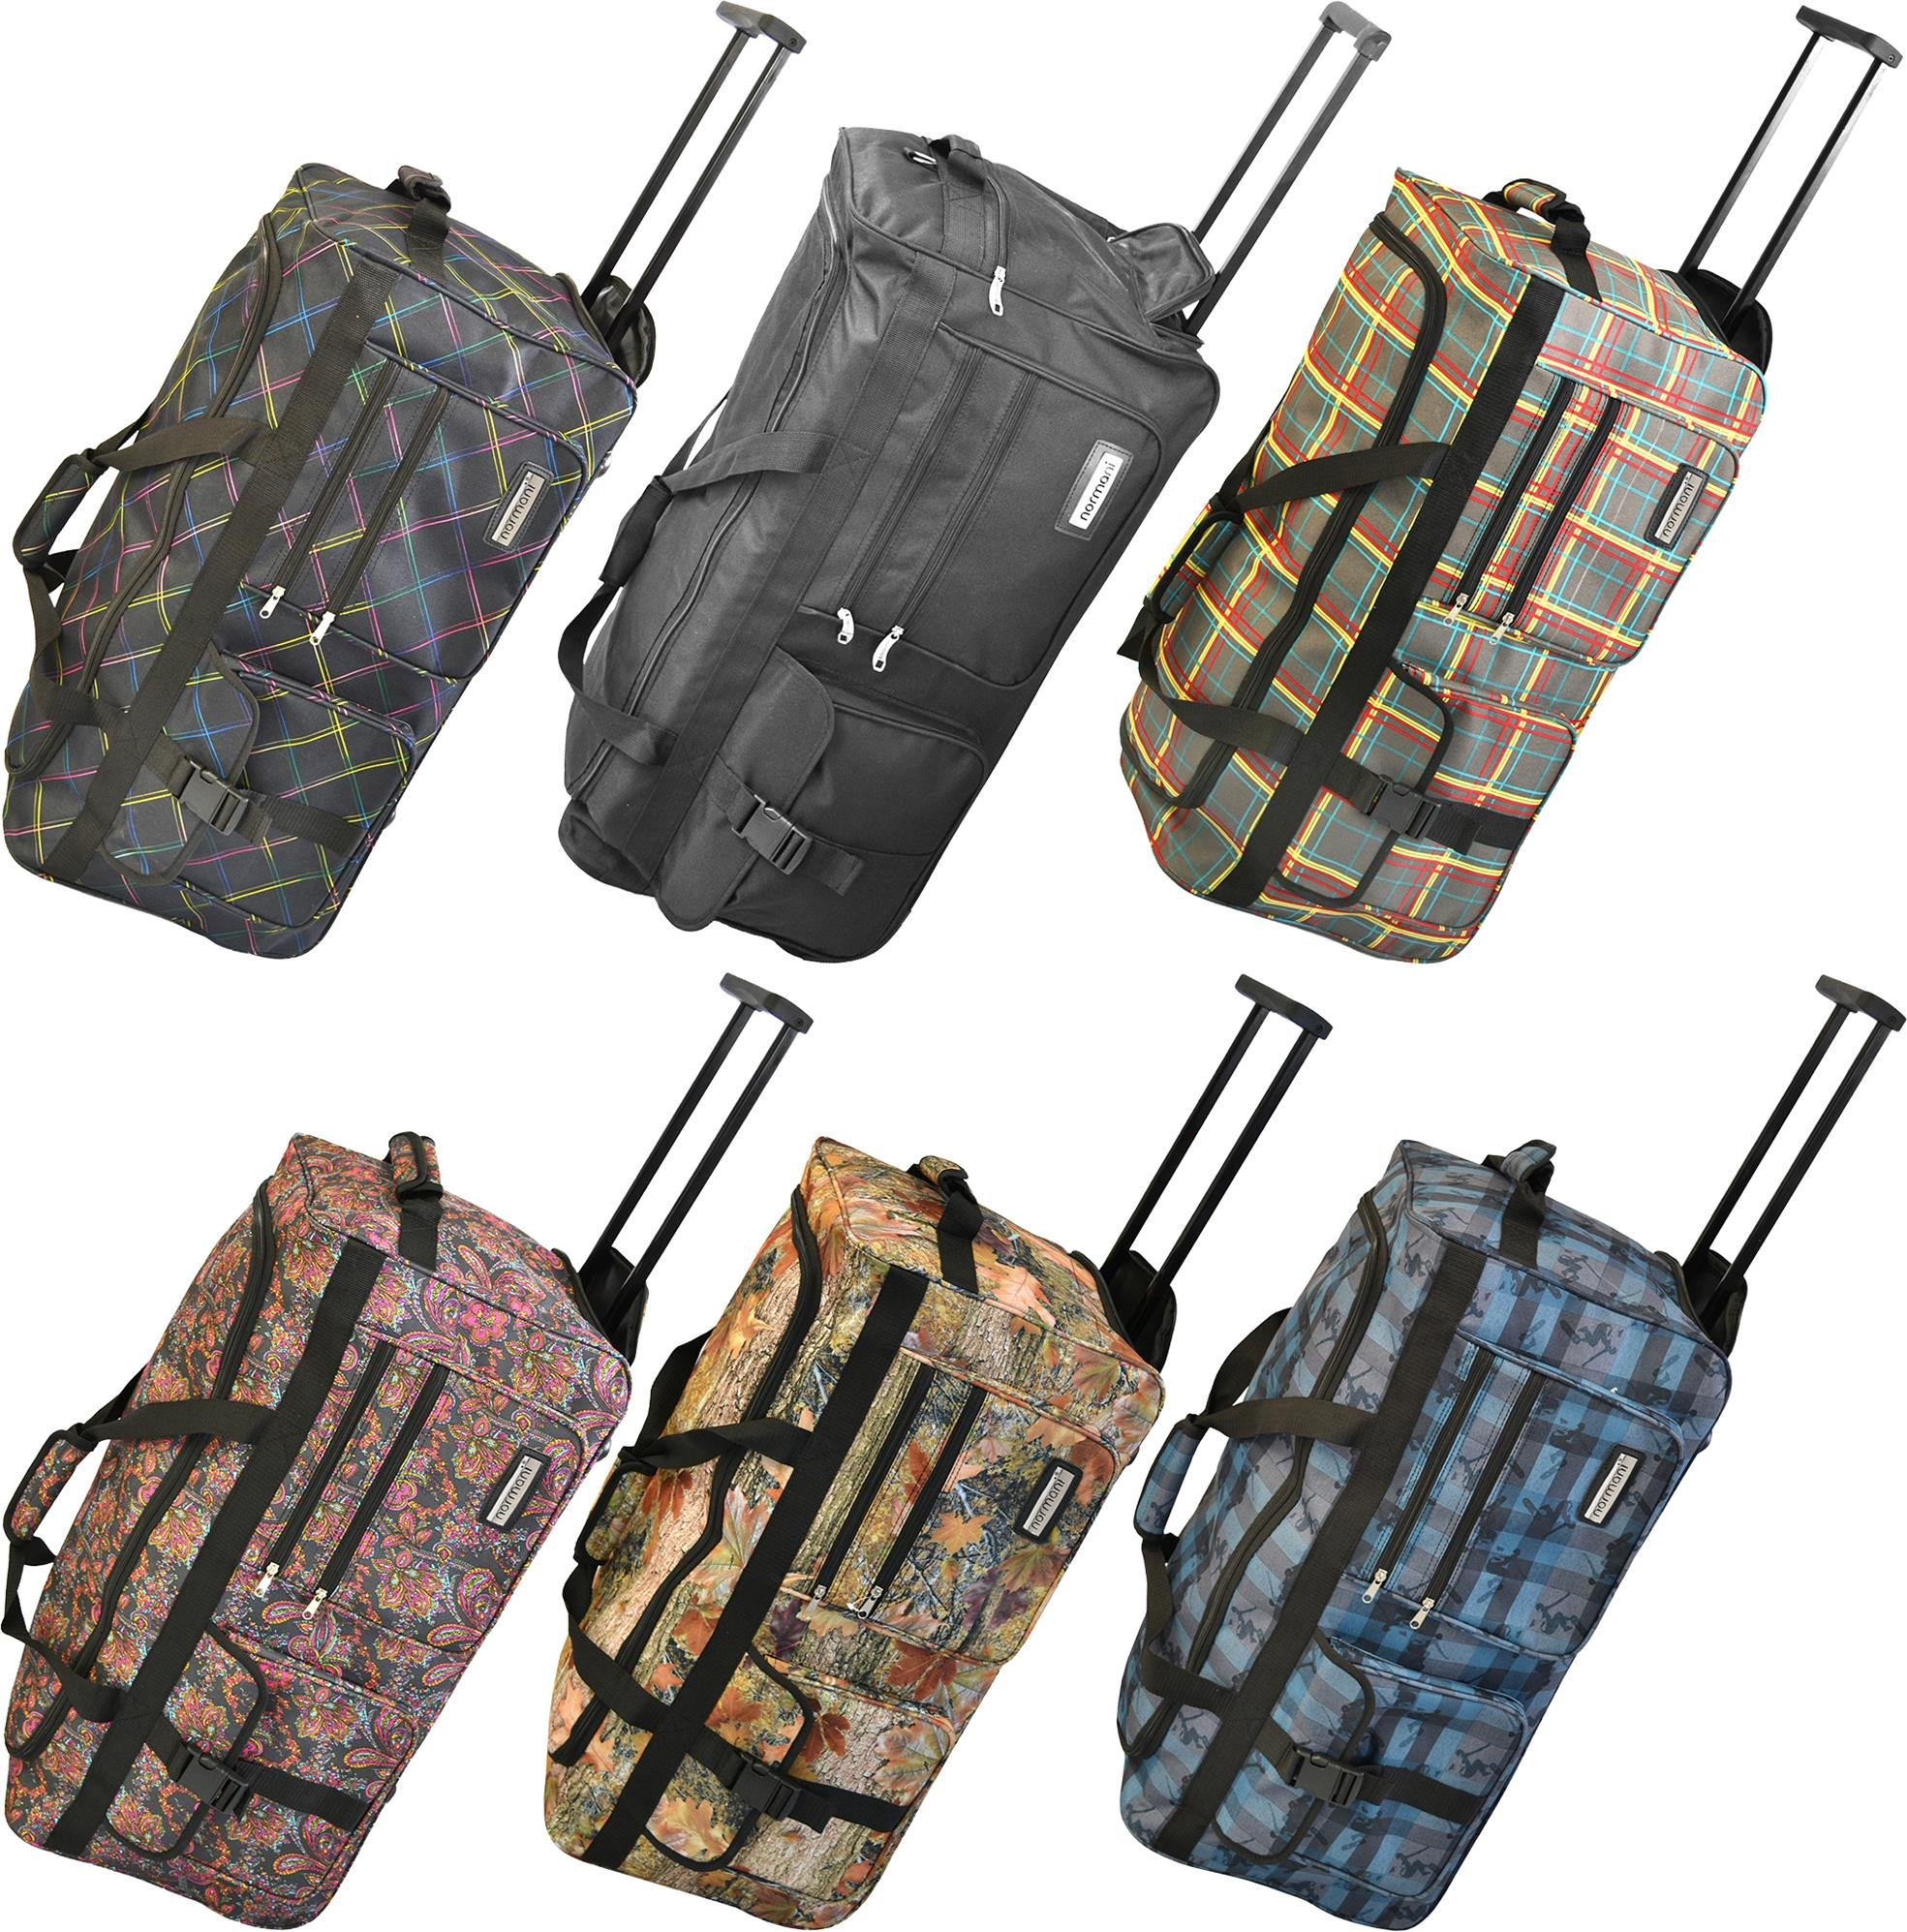 normani reisetasche jumbo big travel 3 rollen riesige 80 liter xxl v4 5 generation neu koffer. Black Bedroom Furniture Sets. Home Design Ideas